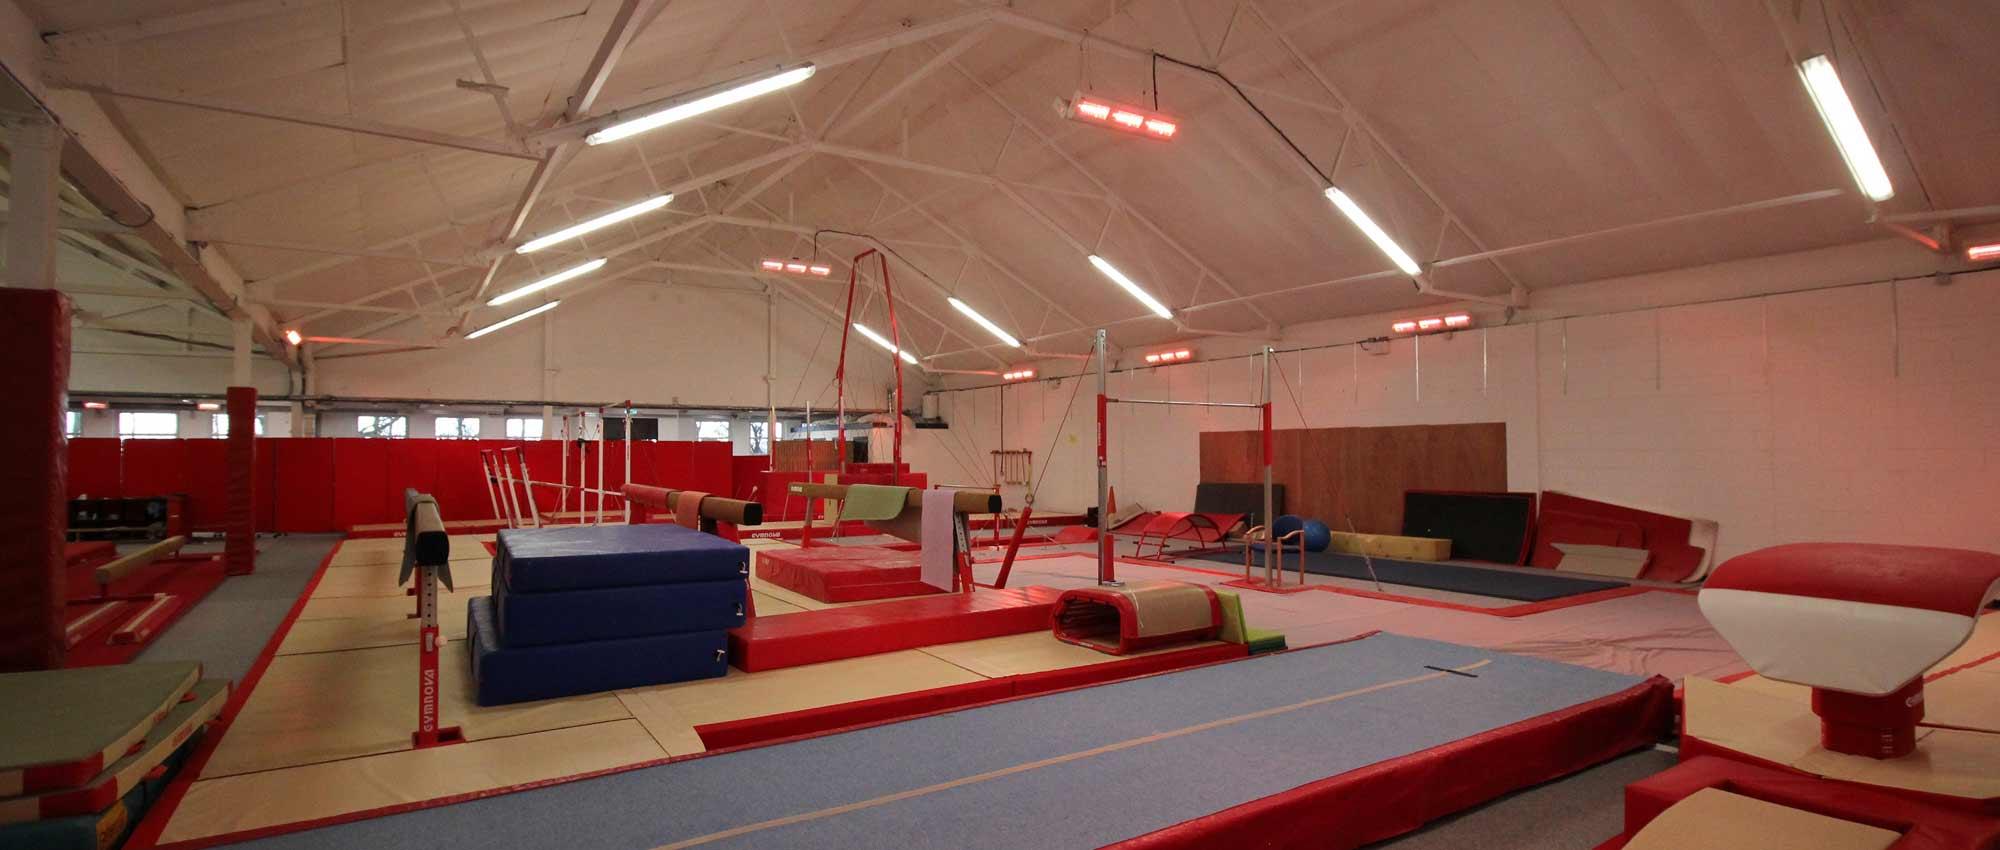 hamilton gymnastics club heaters